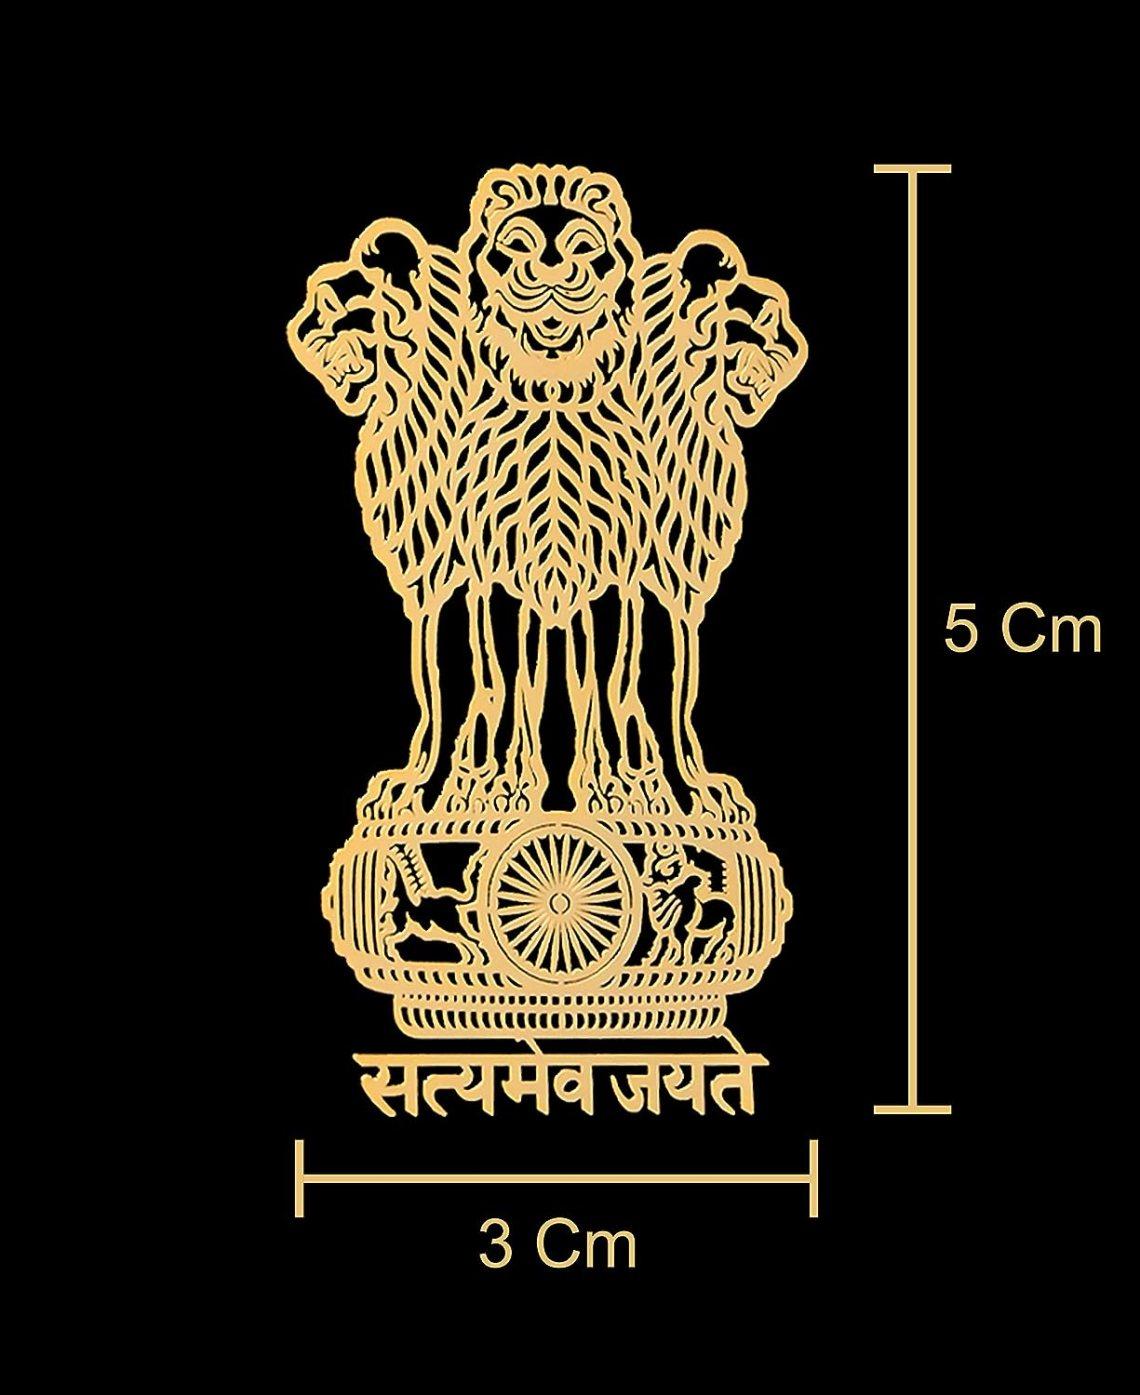 Download Satyamev Jayate Symbol Wallpaper - Wallpaper Dean